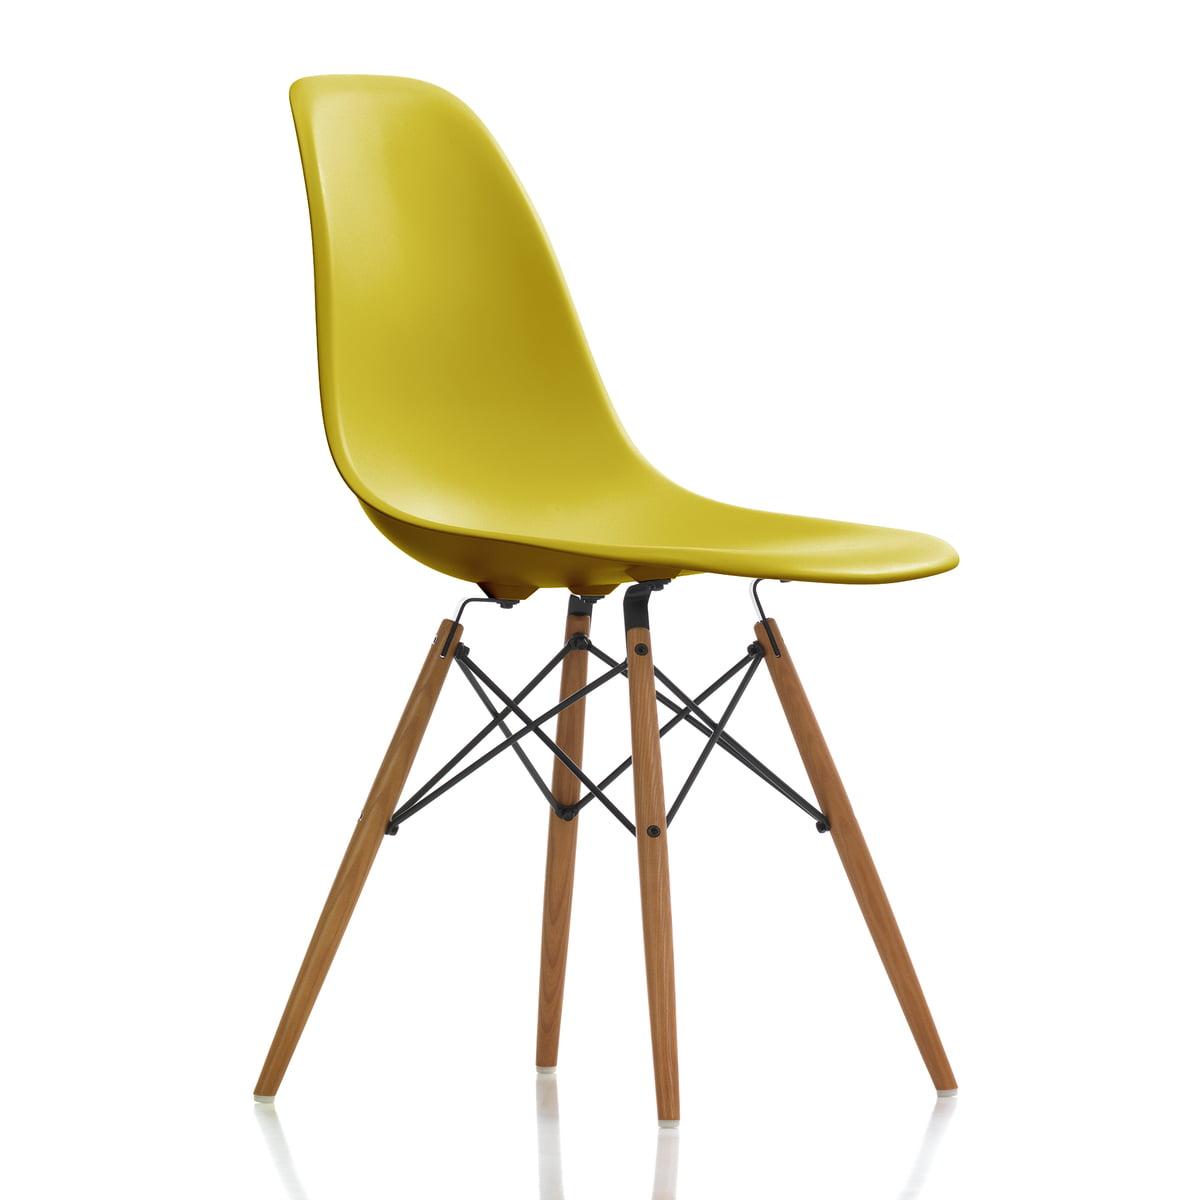 Vitra Eames Plastic Side Chair Dsw H 43 Cm Esche Honigfarben